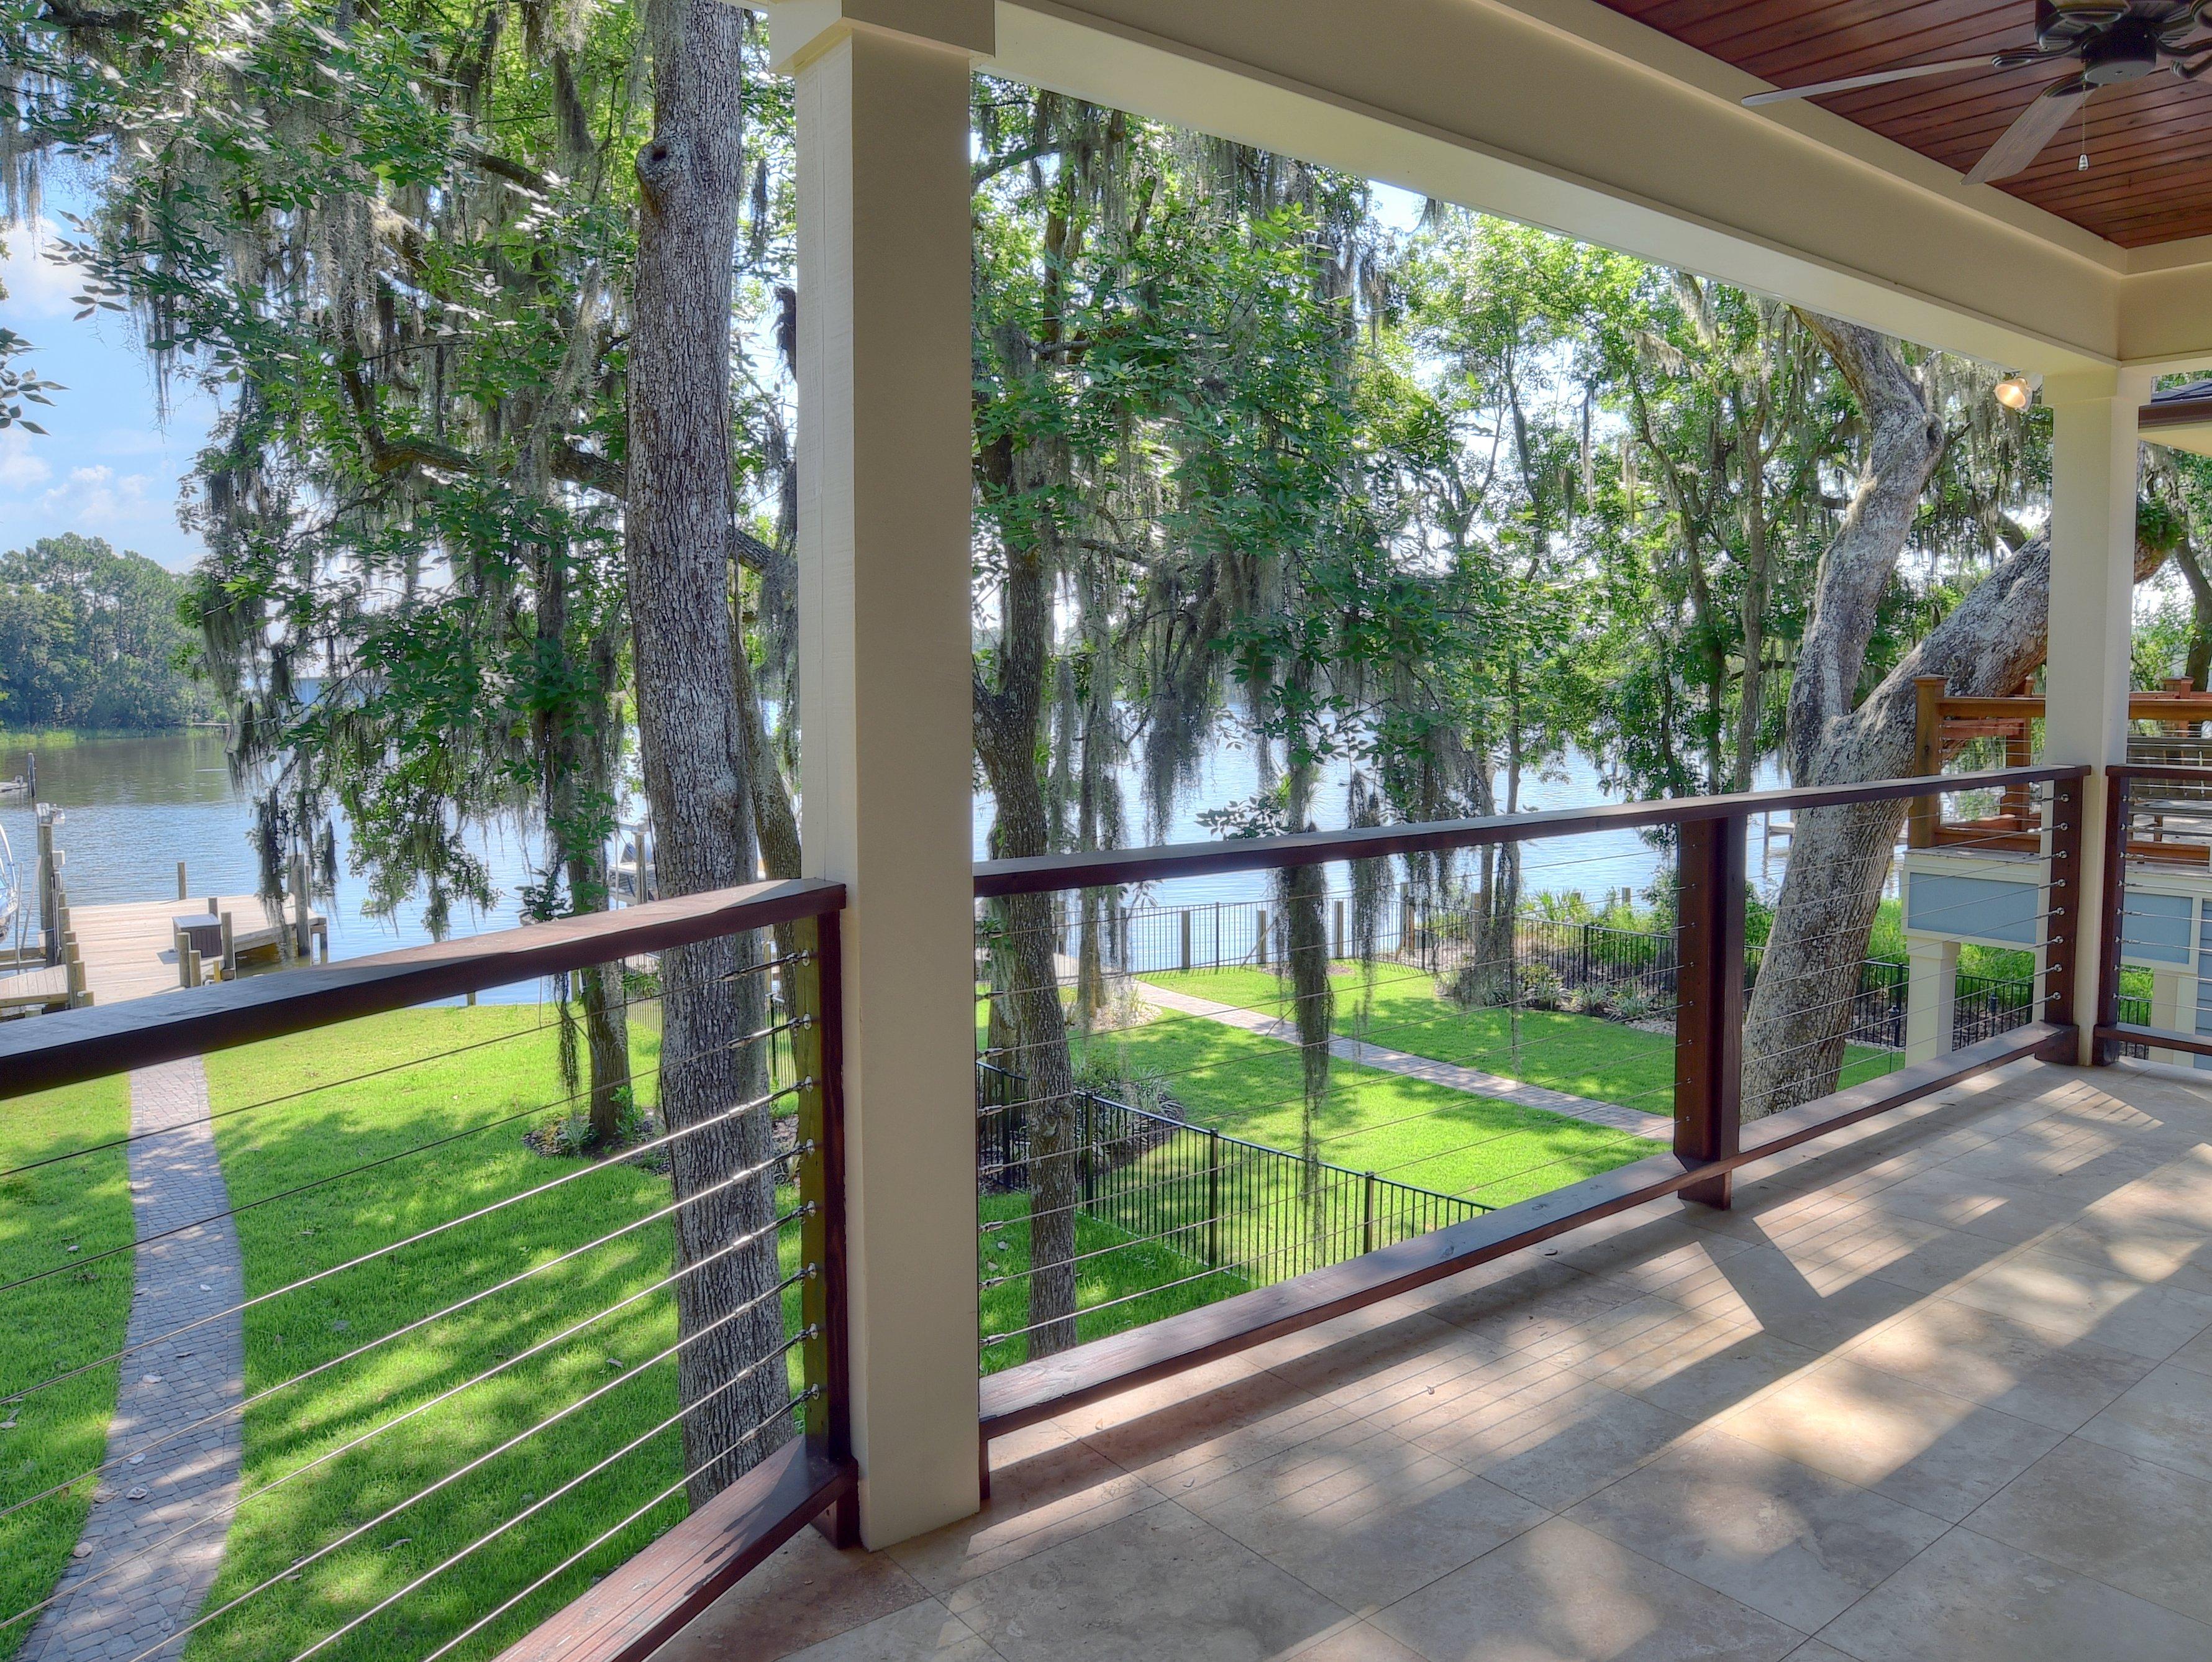 93 Beacon Point Condo rental in Sandestin Rentals ~ Cottages and Villas  in Destin Florida - #3